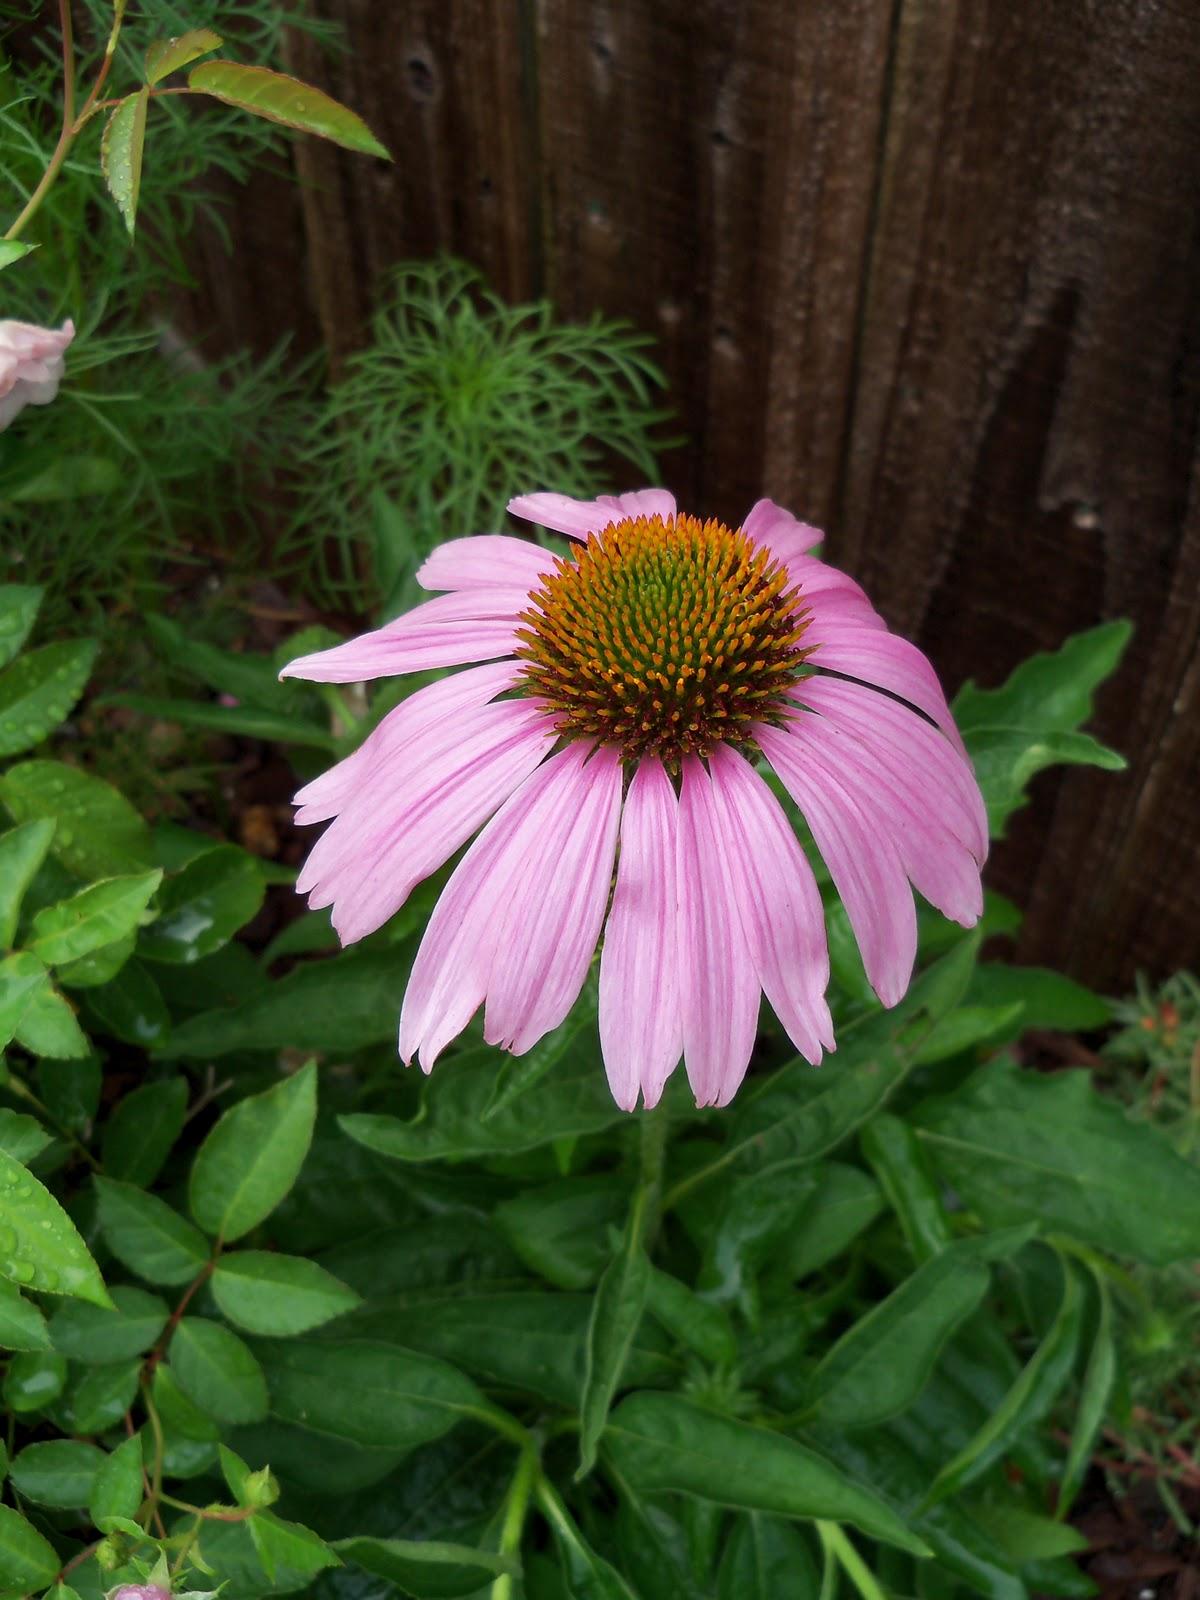 Gardening 2010, Part Two - 101_3211.JPG